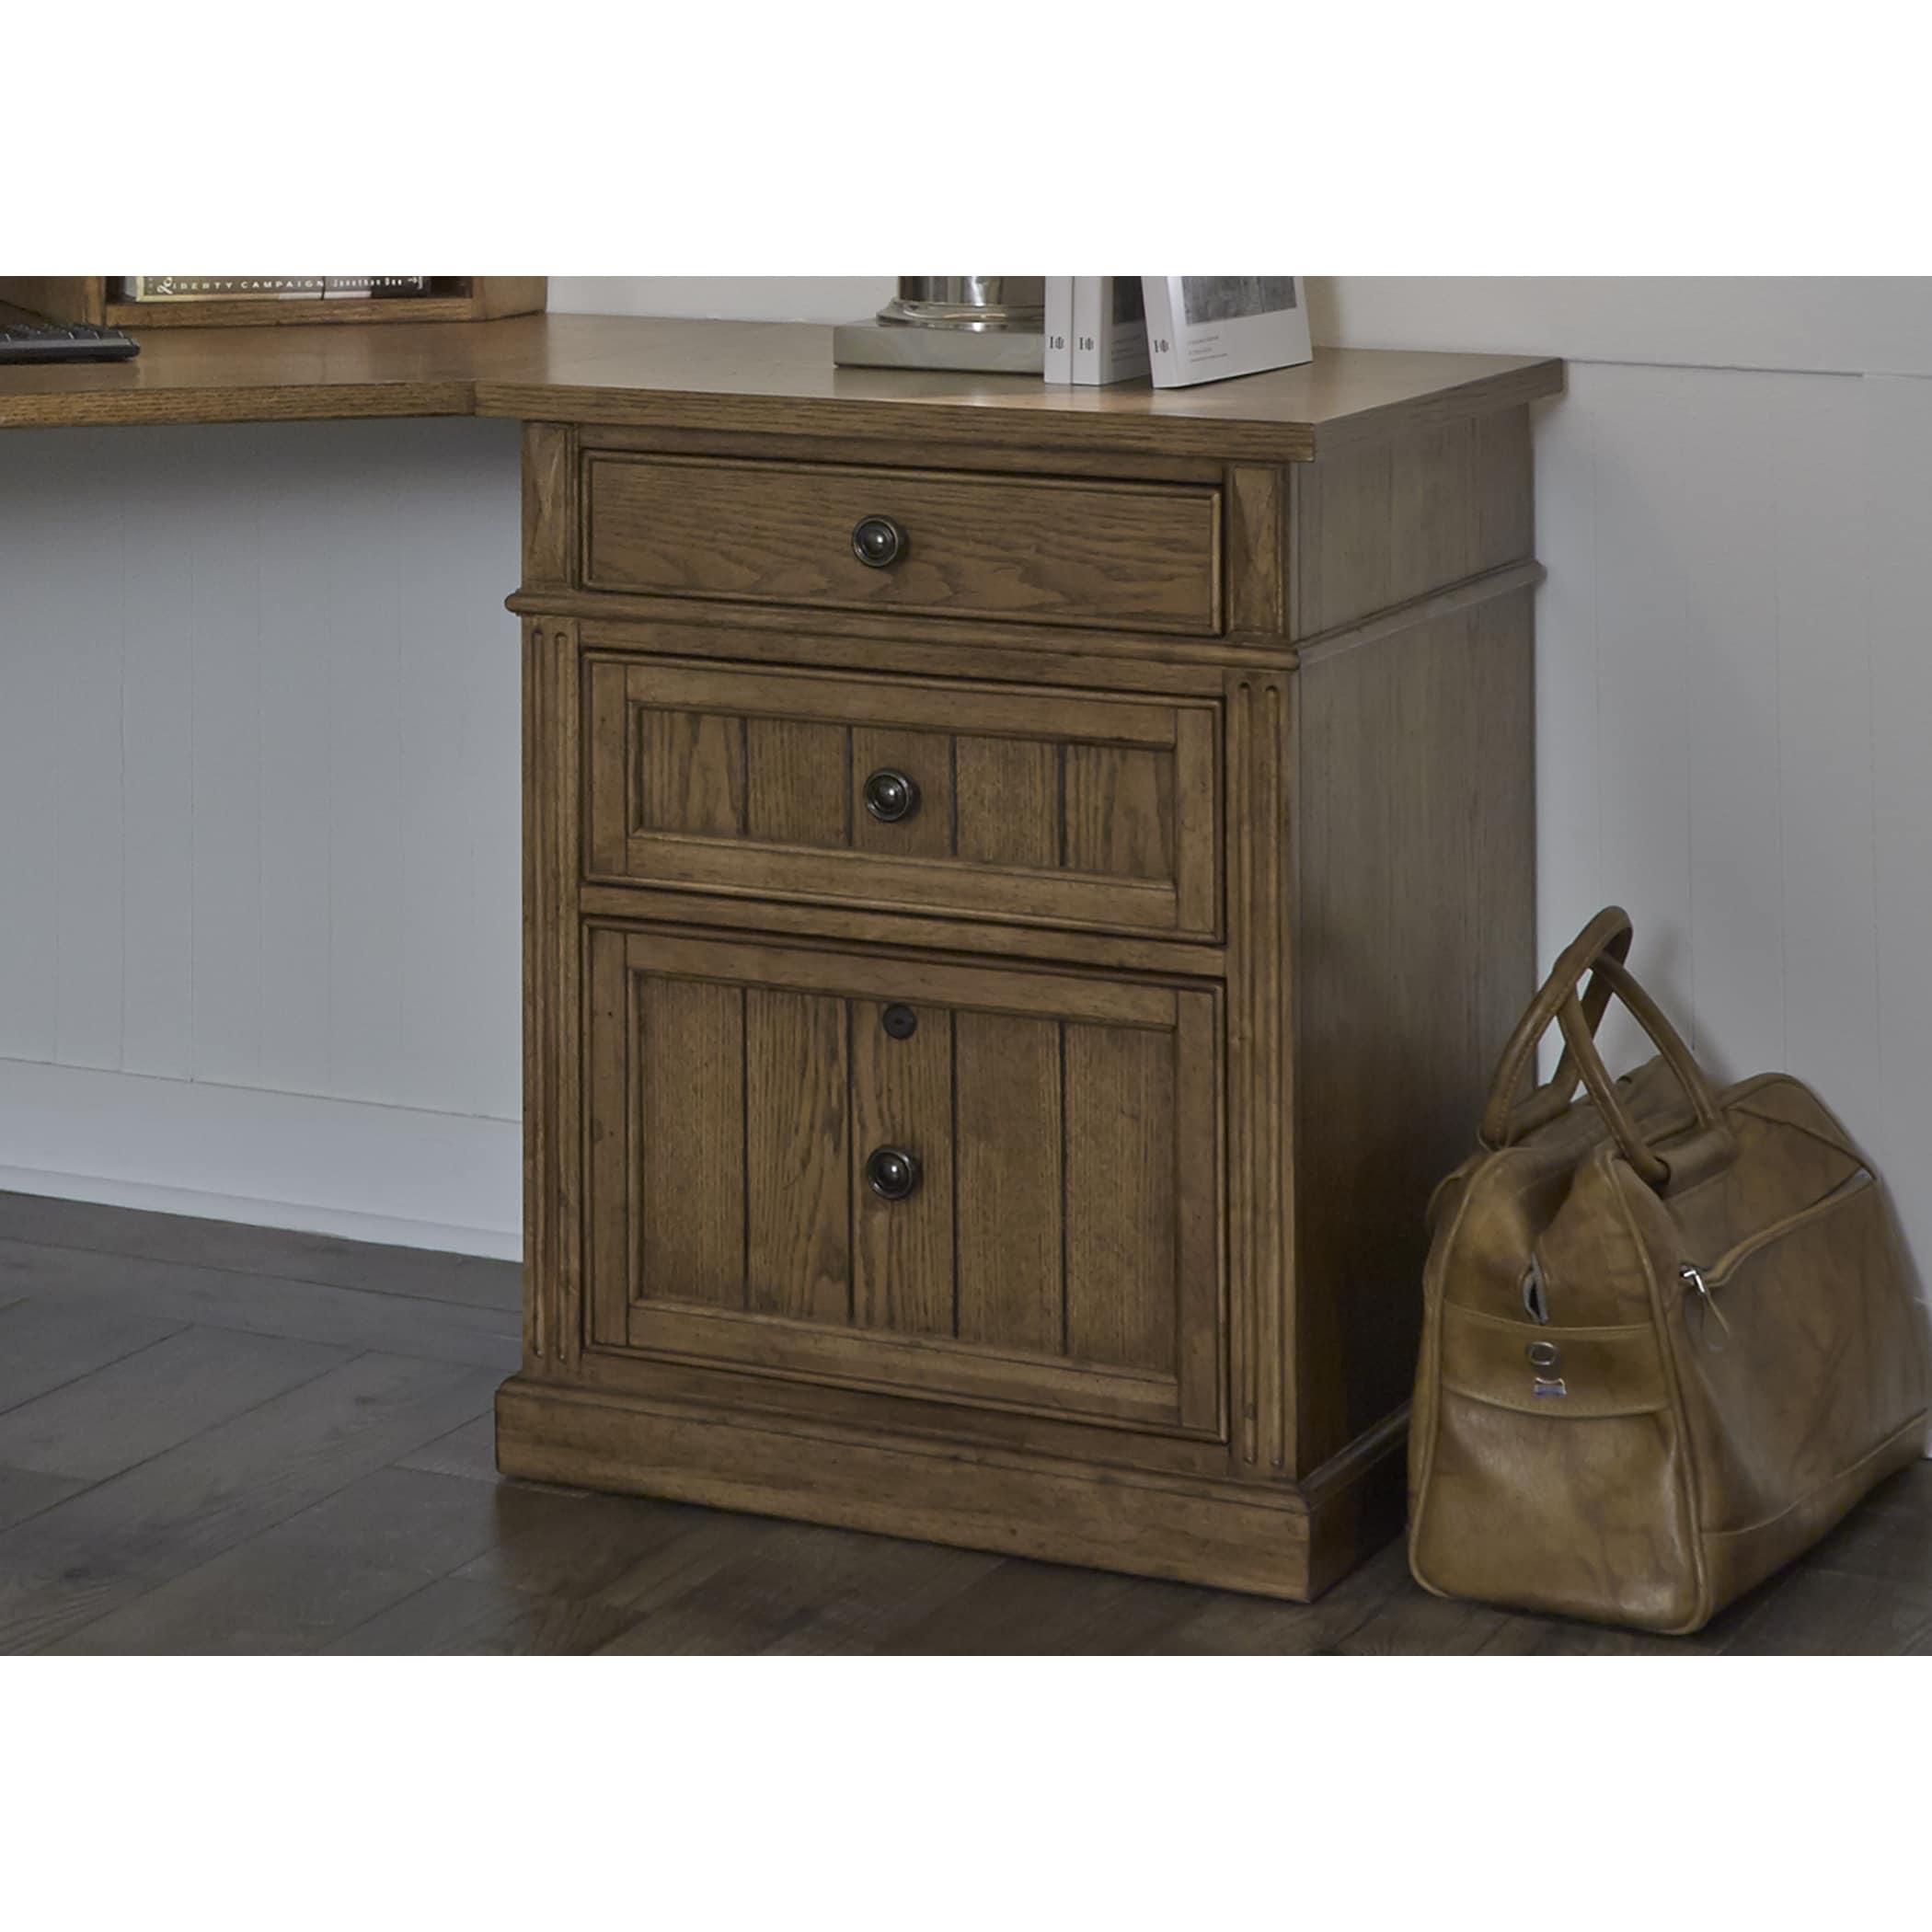 Liberty Cumberland Rustic Oak 24 Inch 3-Drawer File Cabin...